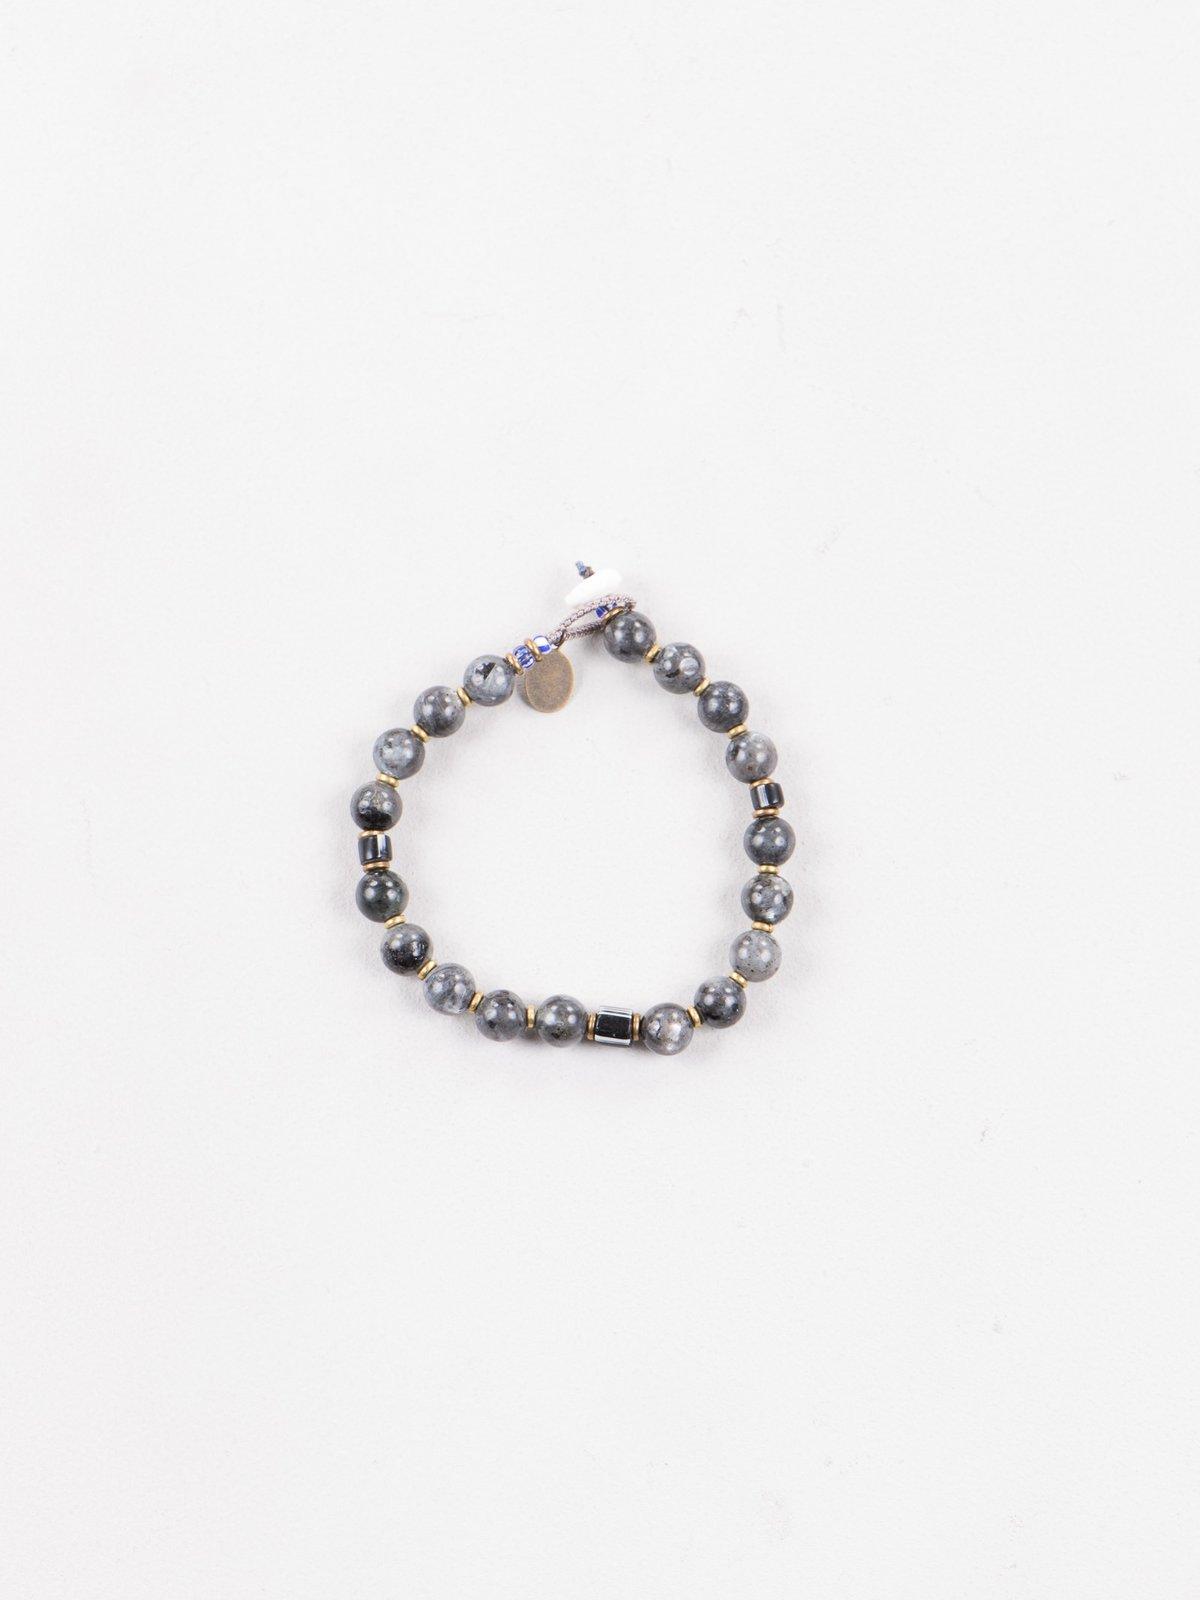 Larvikite 8mm Bracelet - Image 1